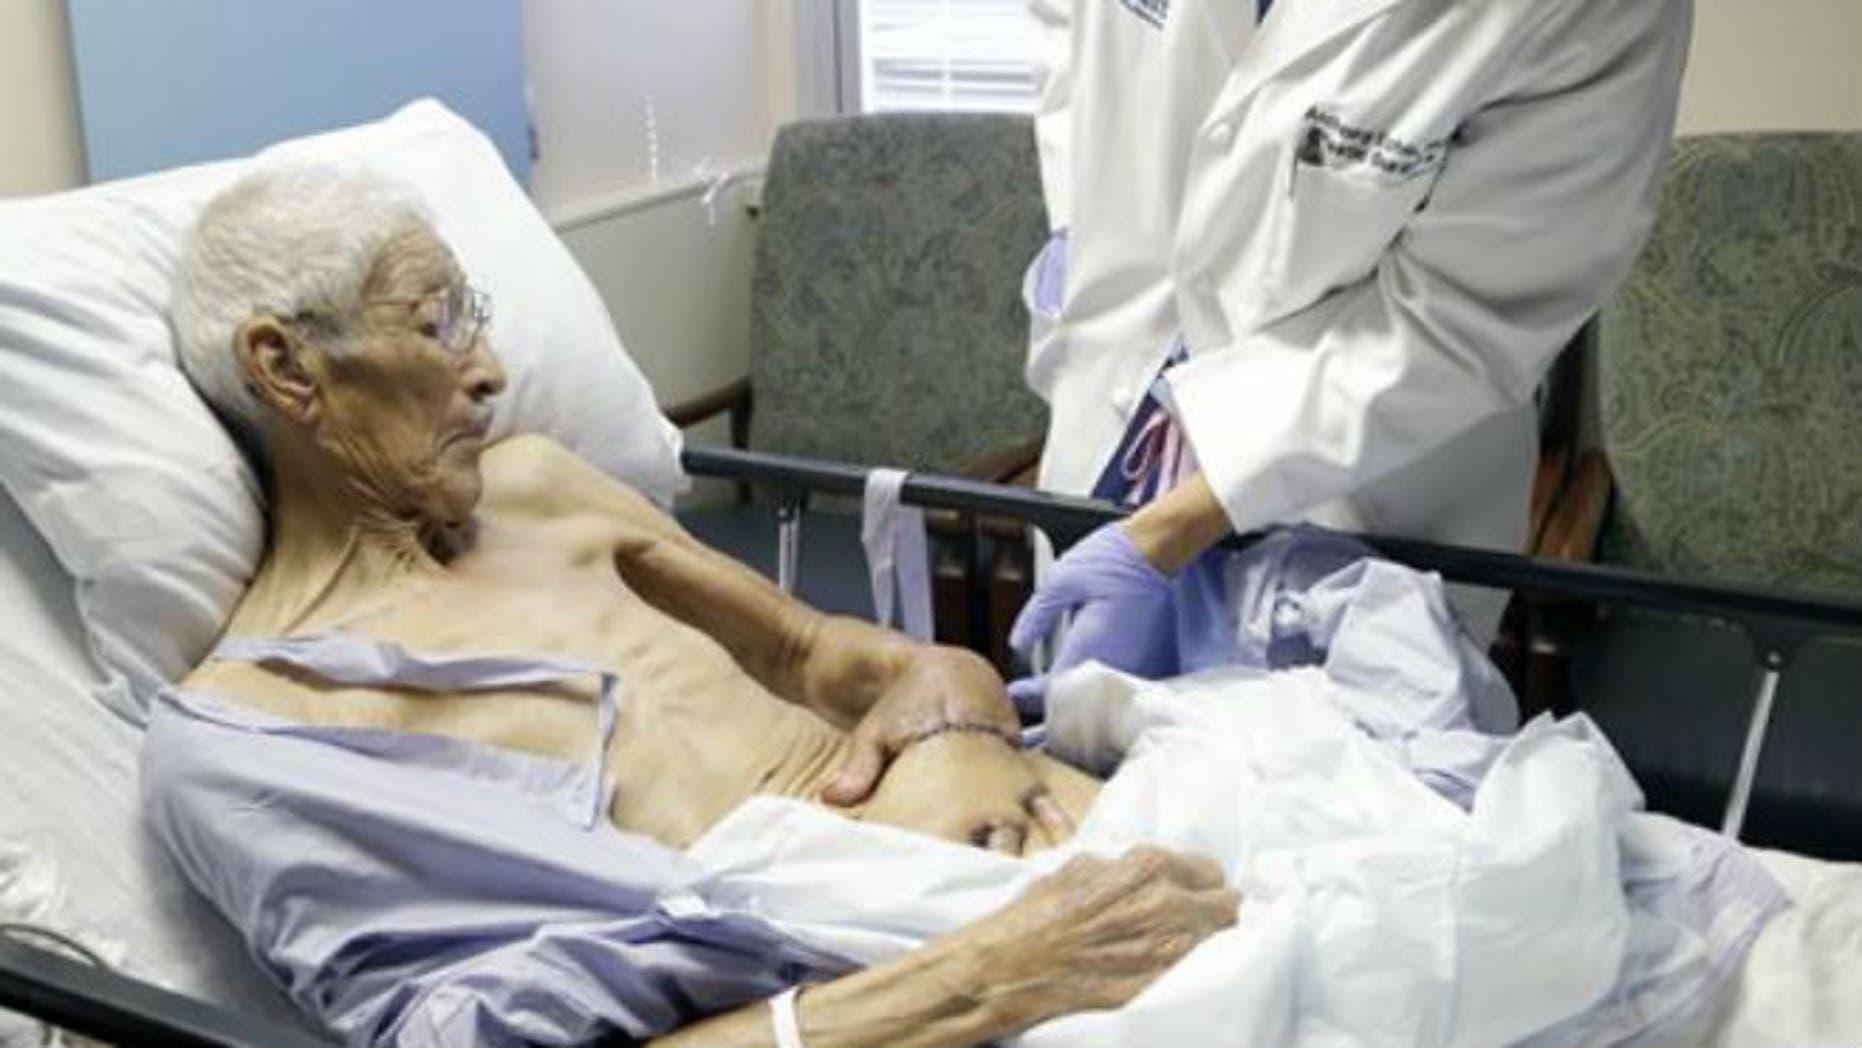 Plastic surgeon Anthony Echo, right, examines Frank Reyes' hand before surgery at Houston Methodist Hospital in Houston on Thursday, Aug. 27, 2015. (AP Photo/Pat Sullivan)